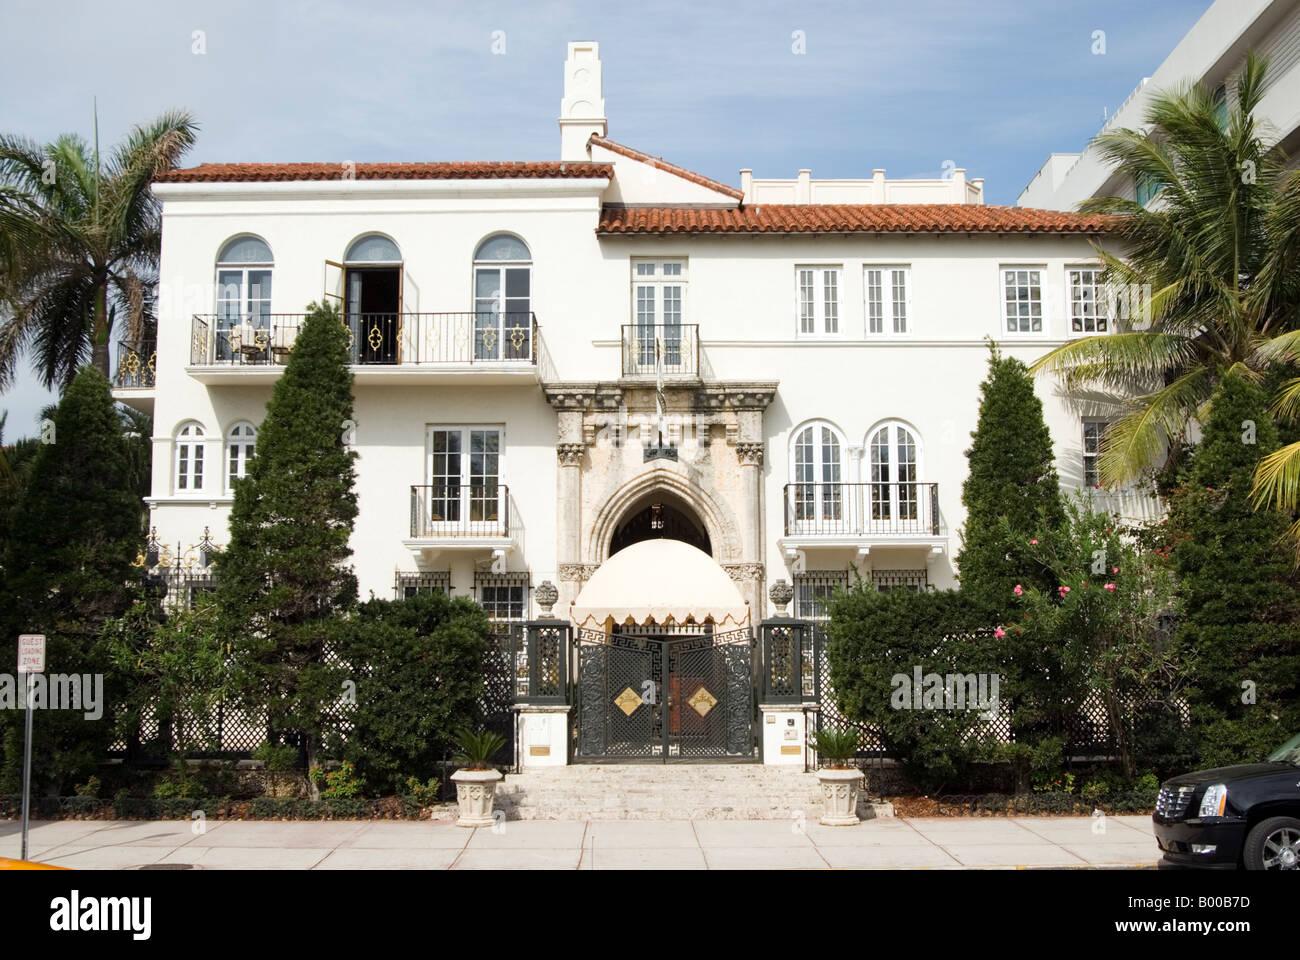 Casa Casuarina Hotel South Beach